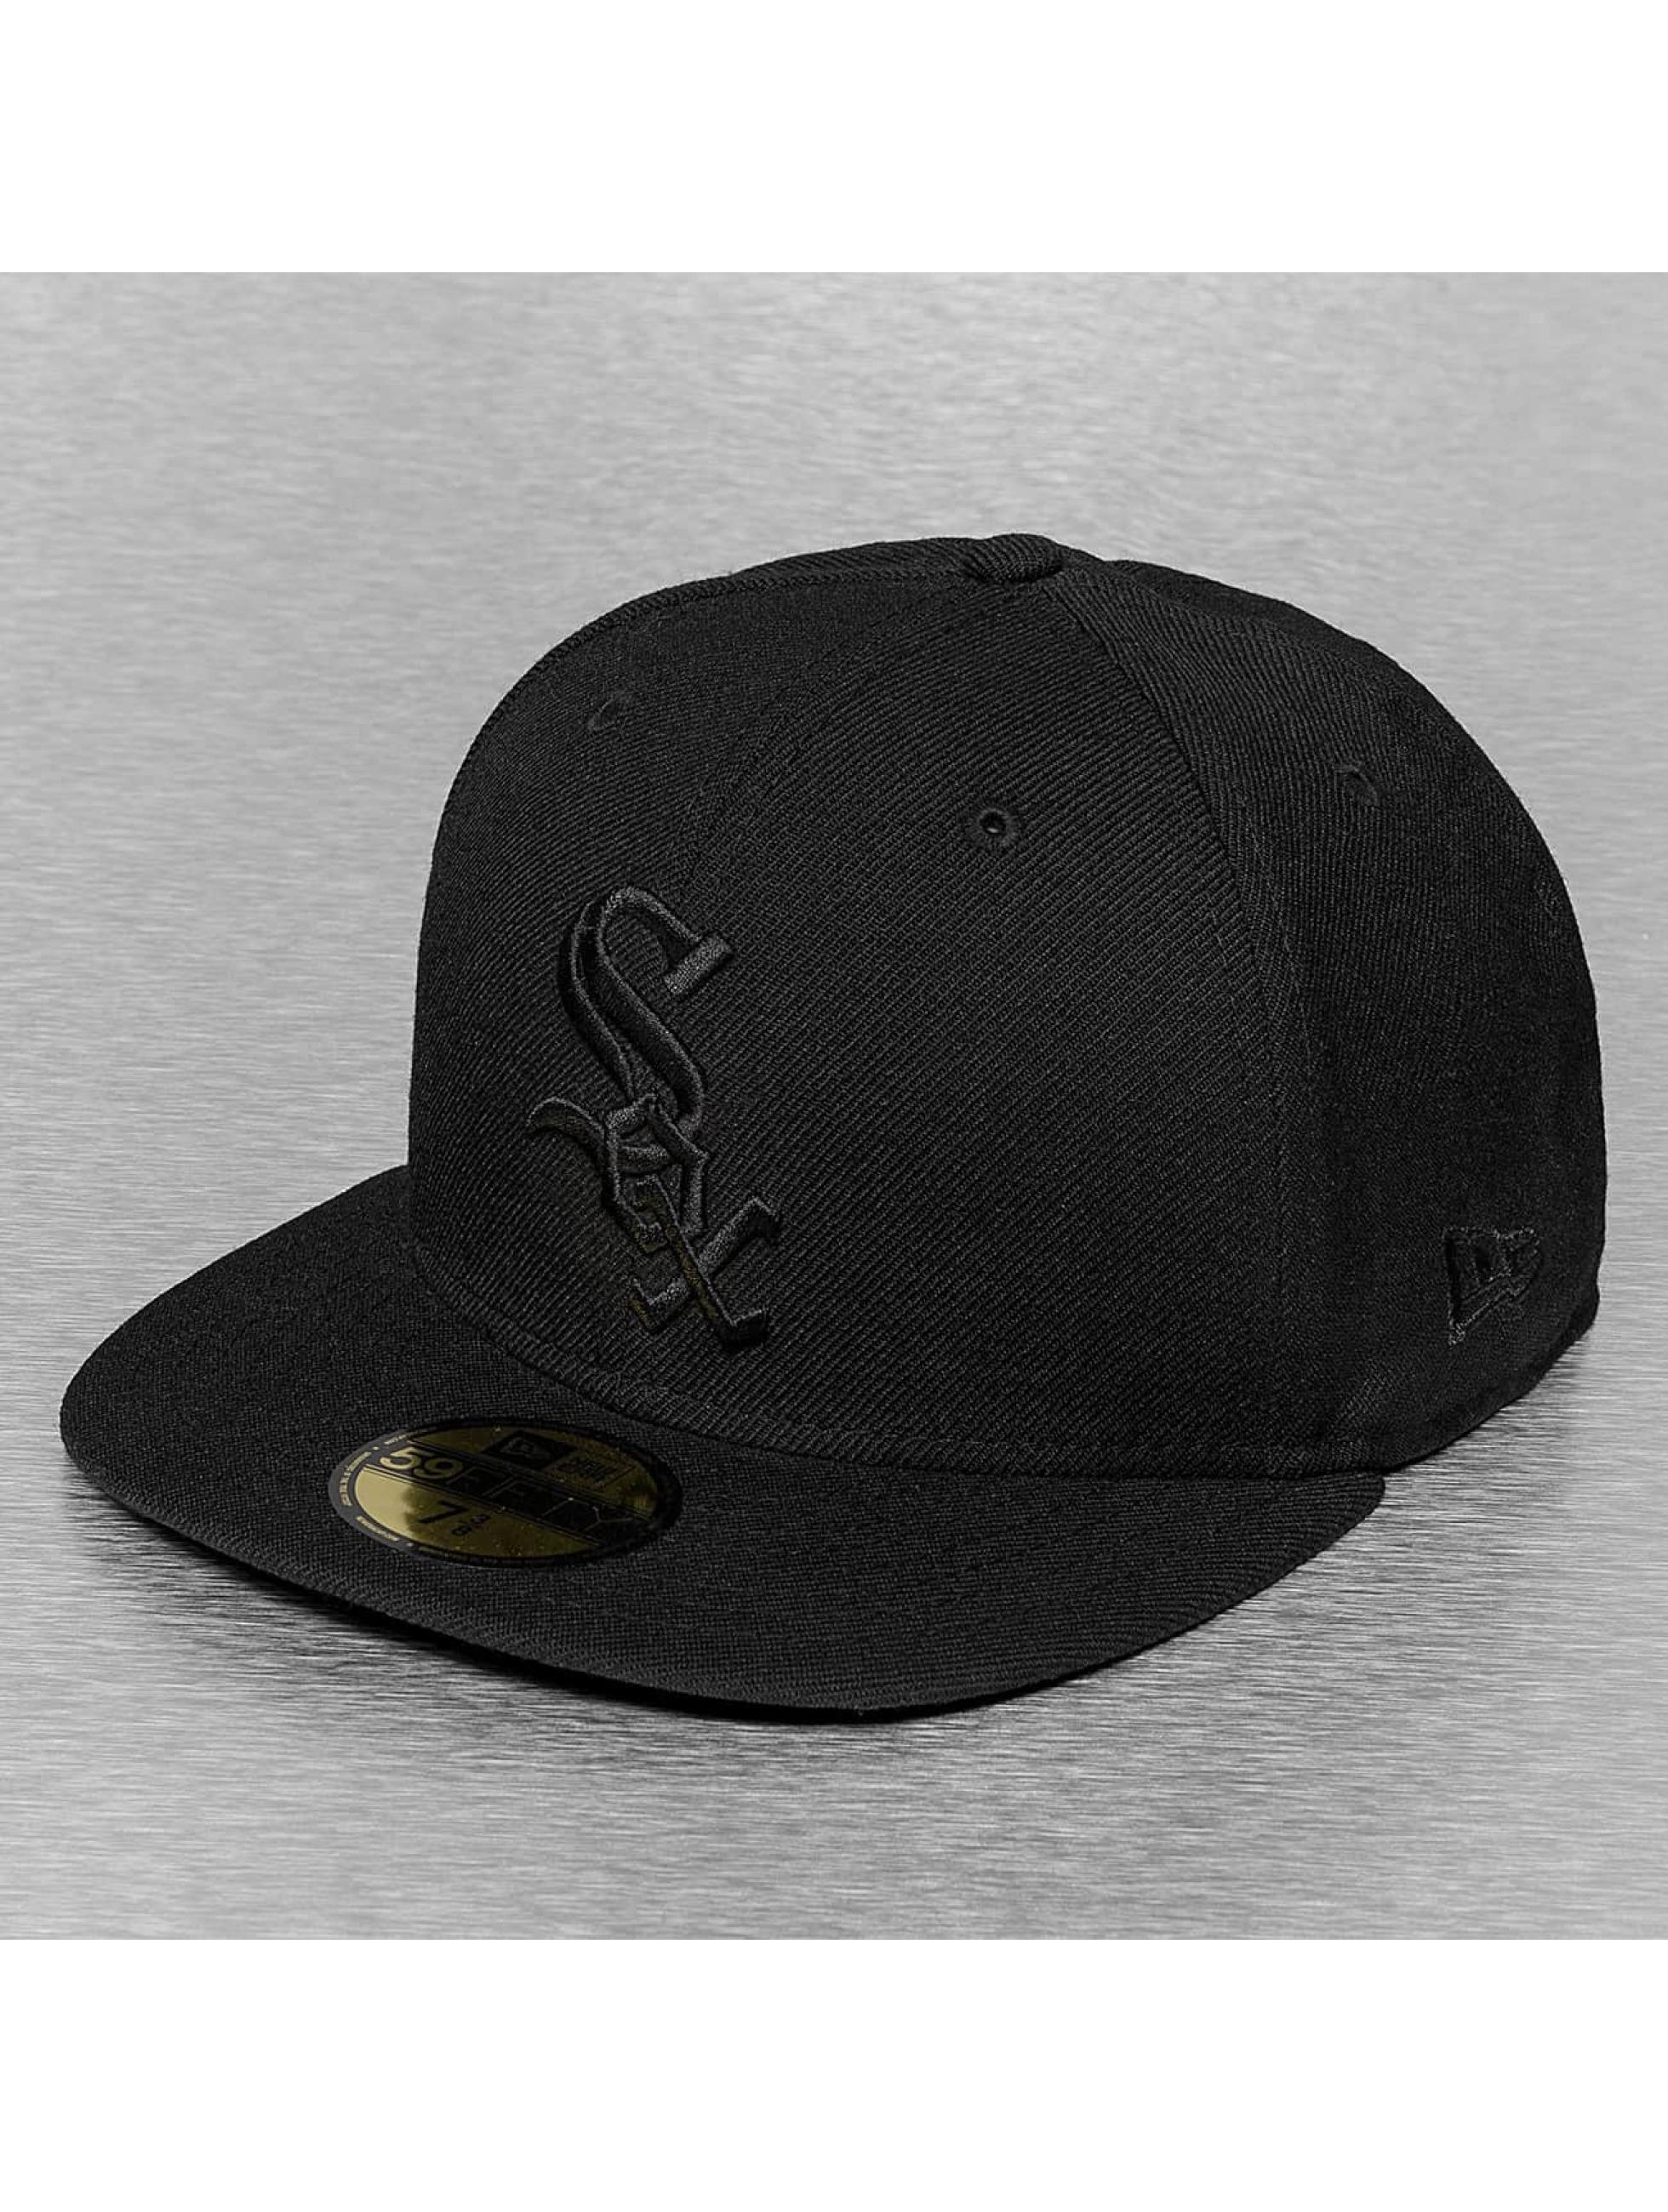 New Era Fitted Cap Black On Black Chicago White Sox zwart